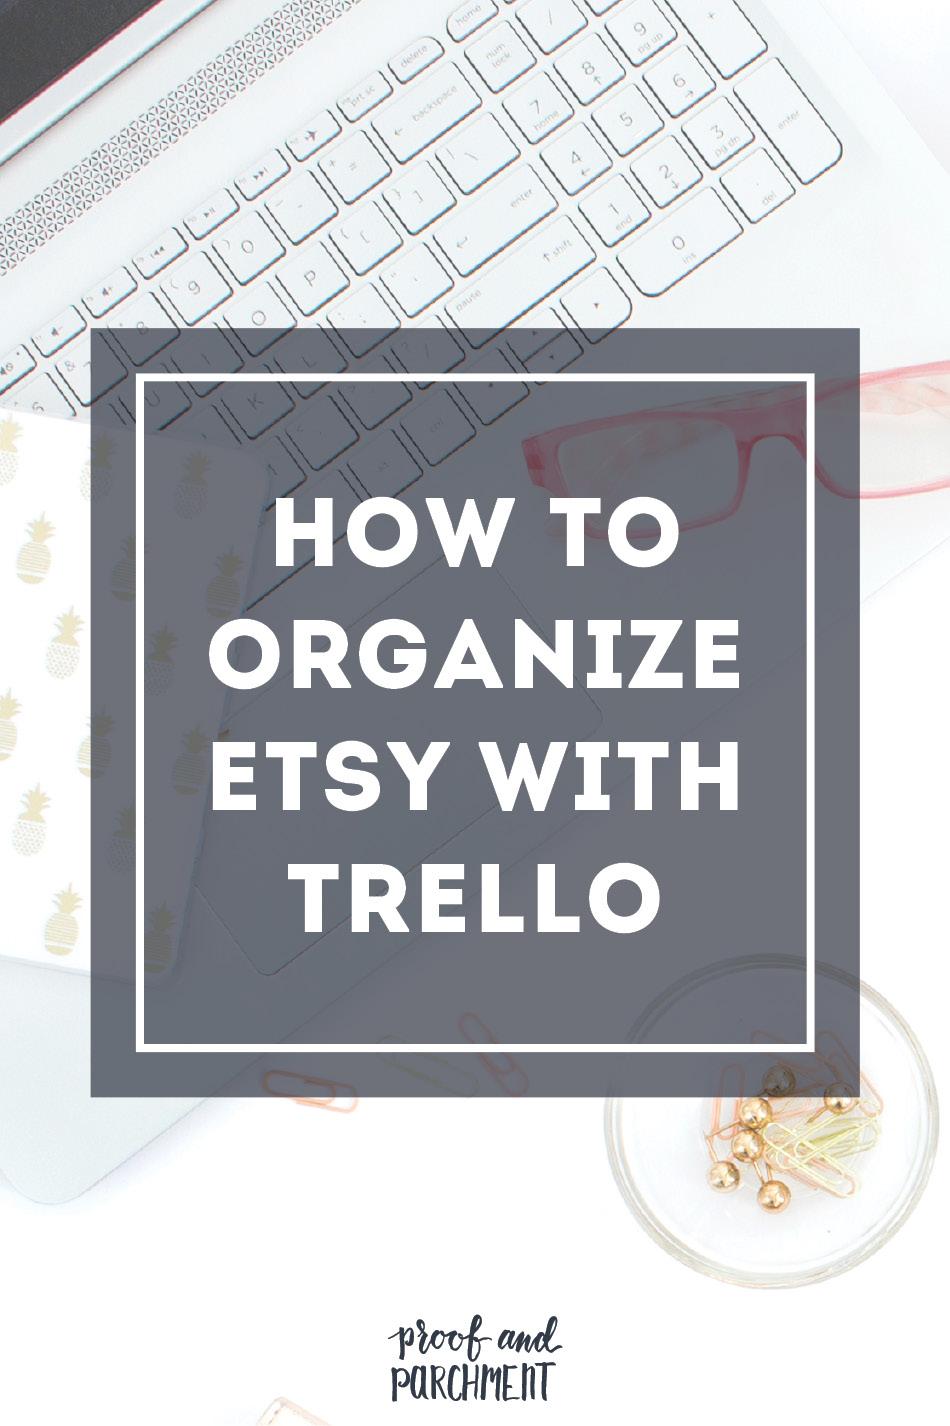 How to Organize Etsy with Trello Header